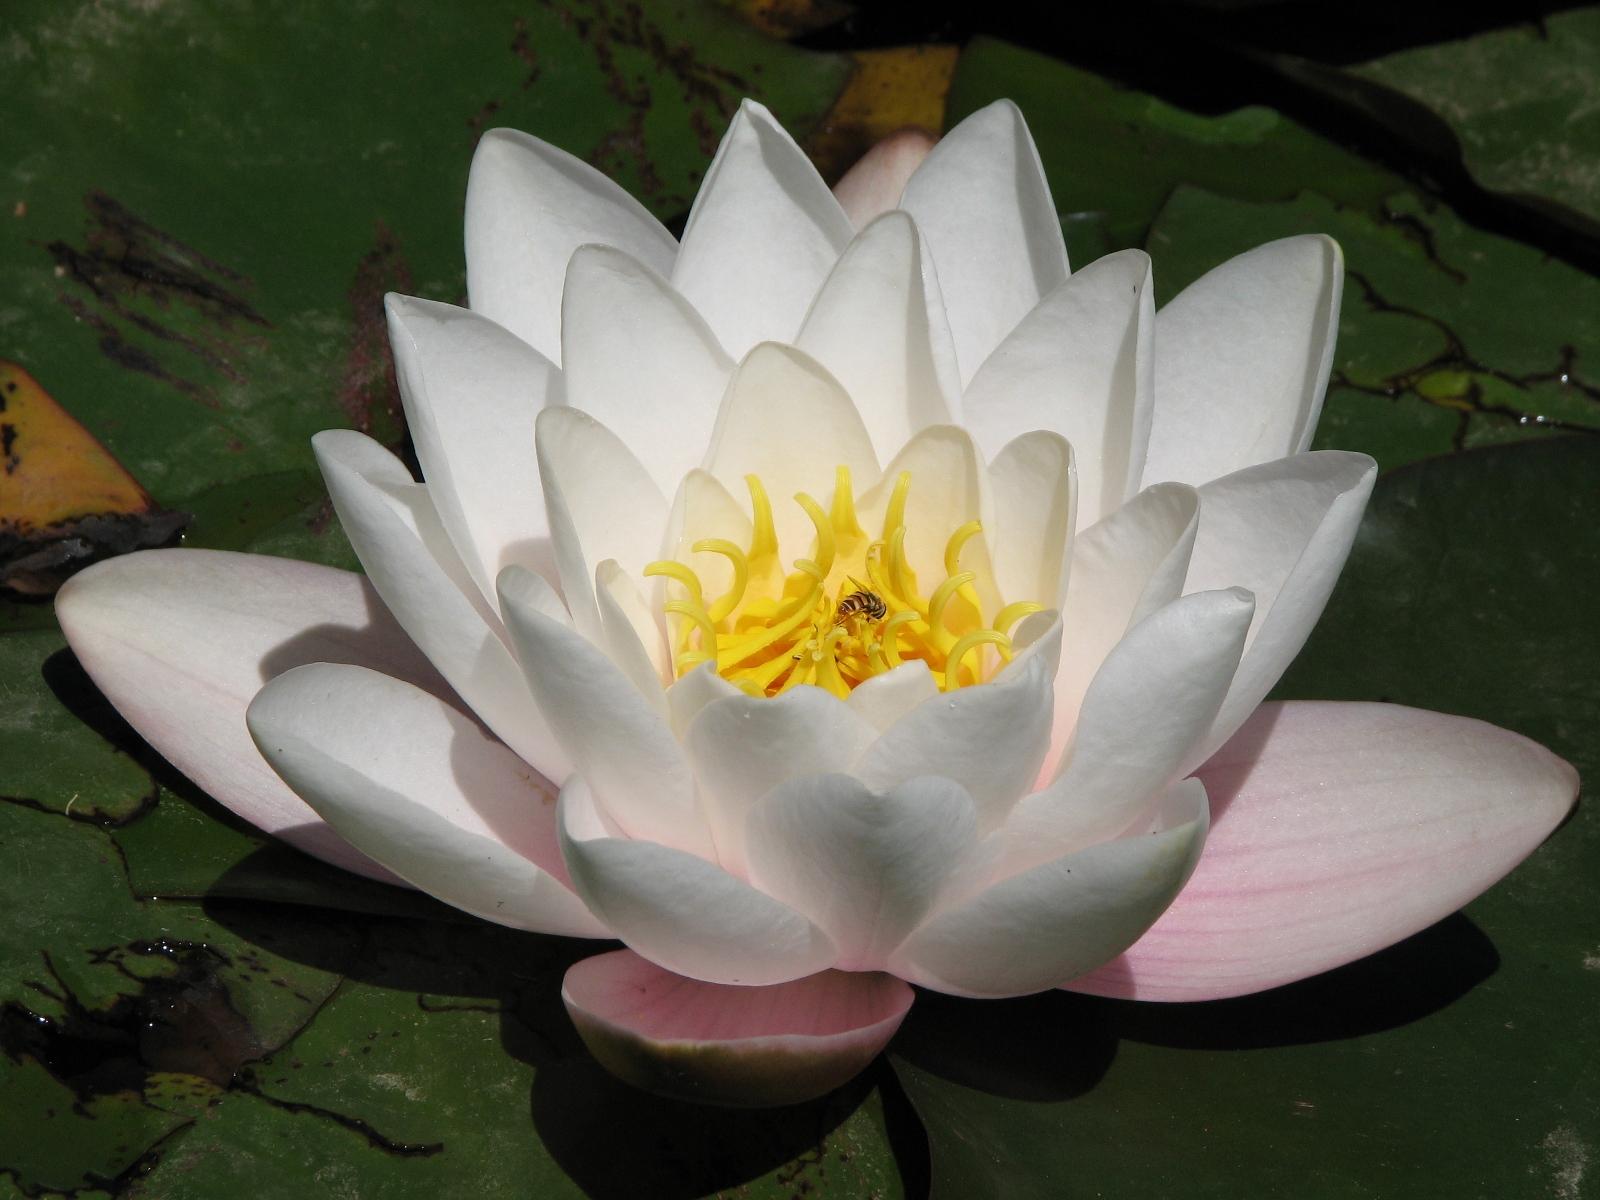 Beautiful new hd wallpapers of lotus flowers full free